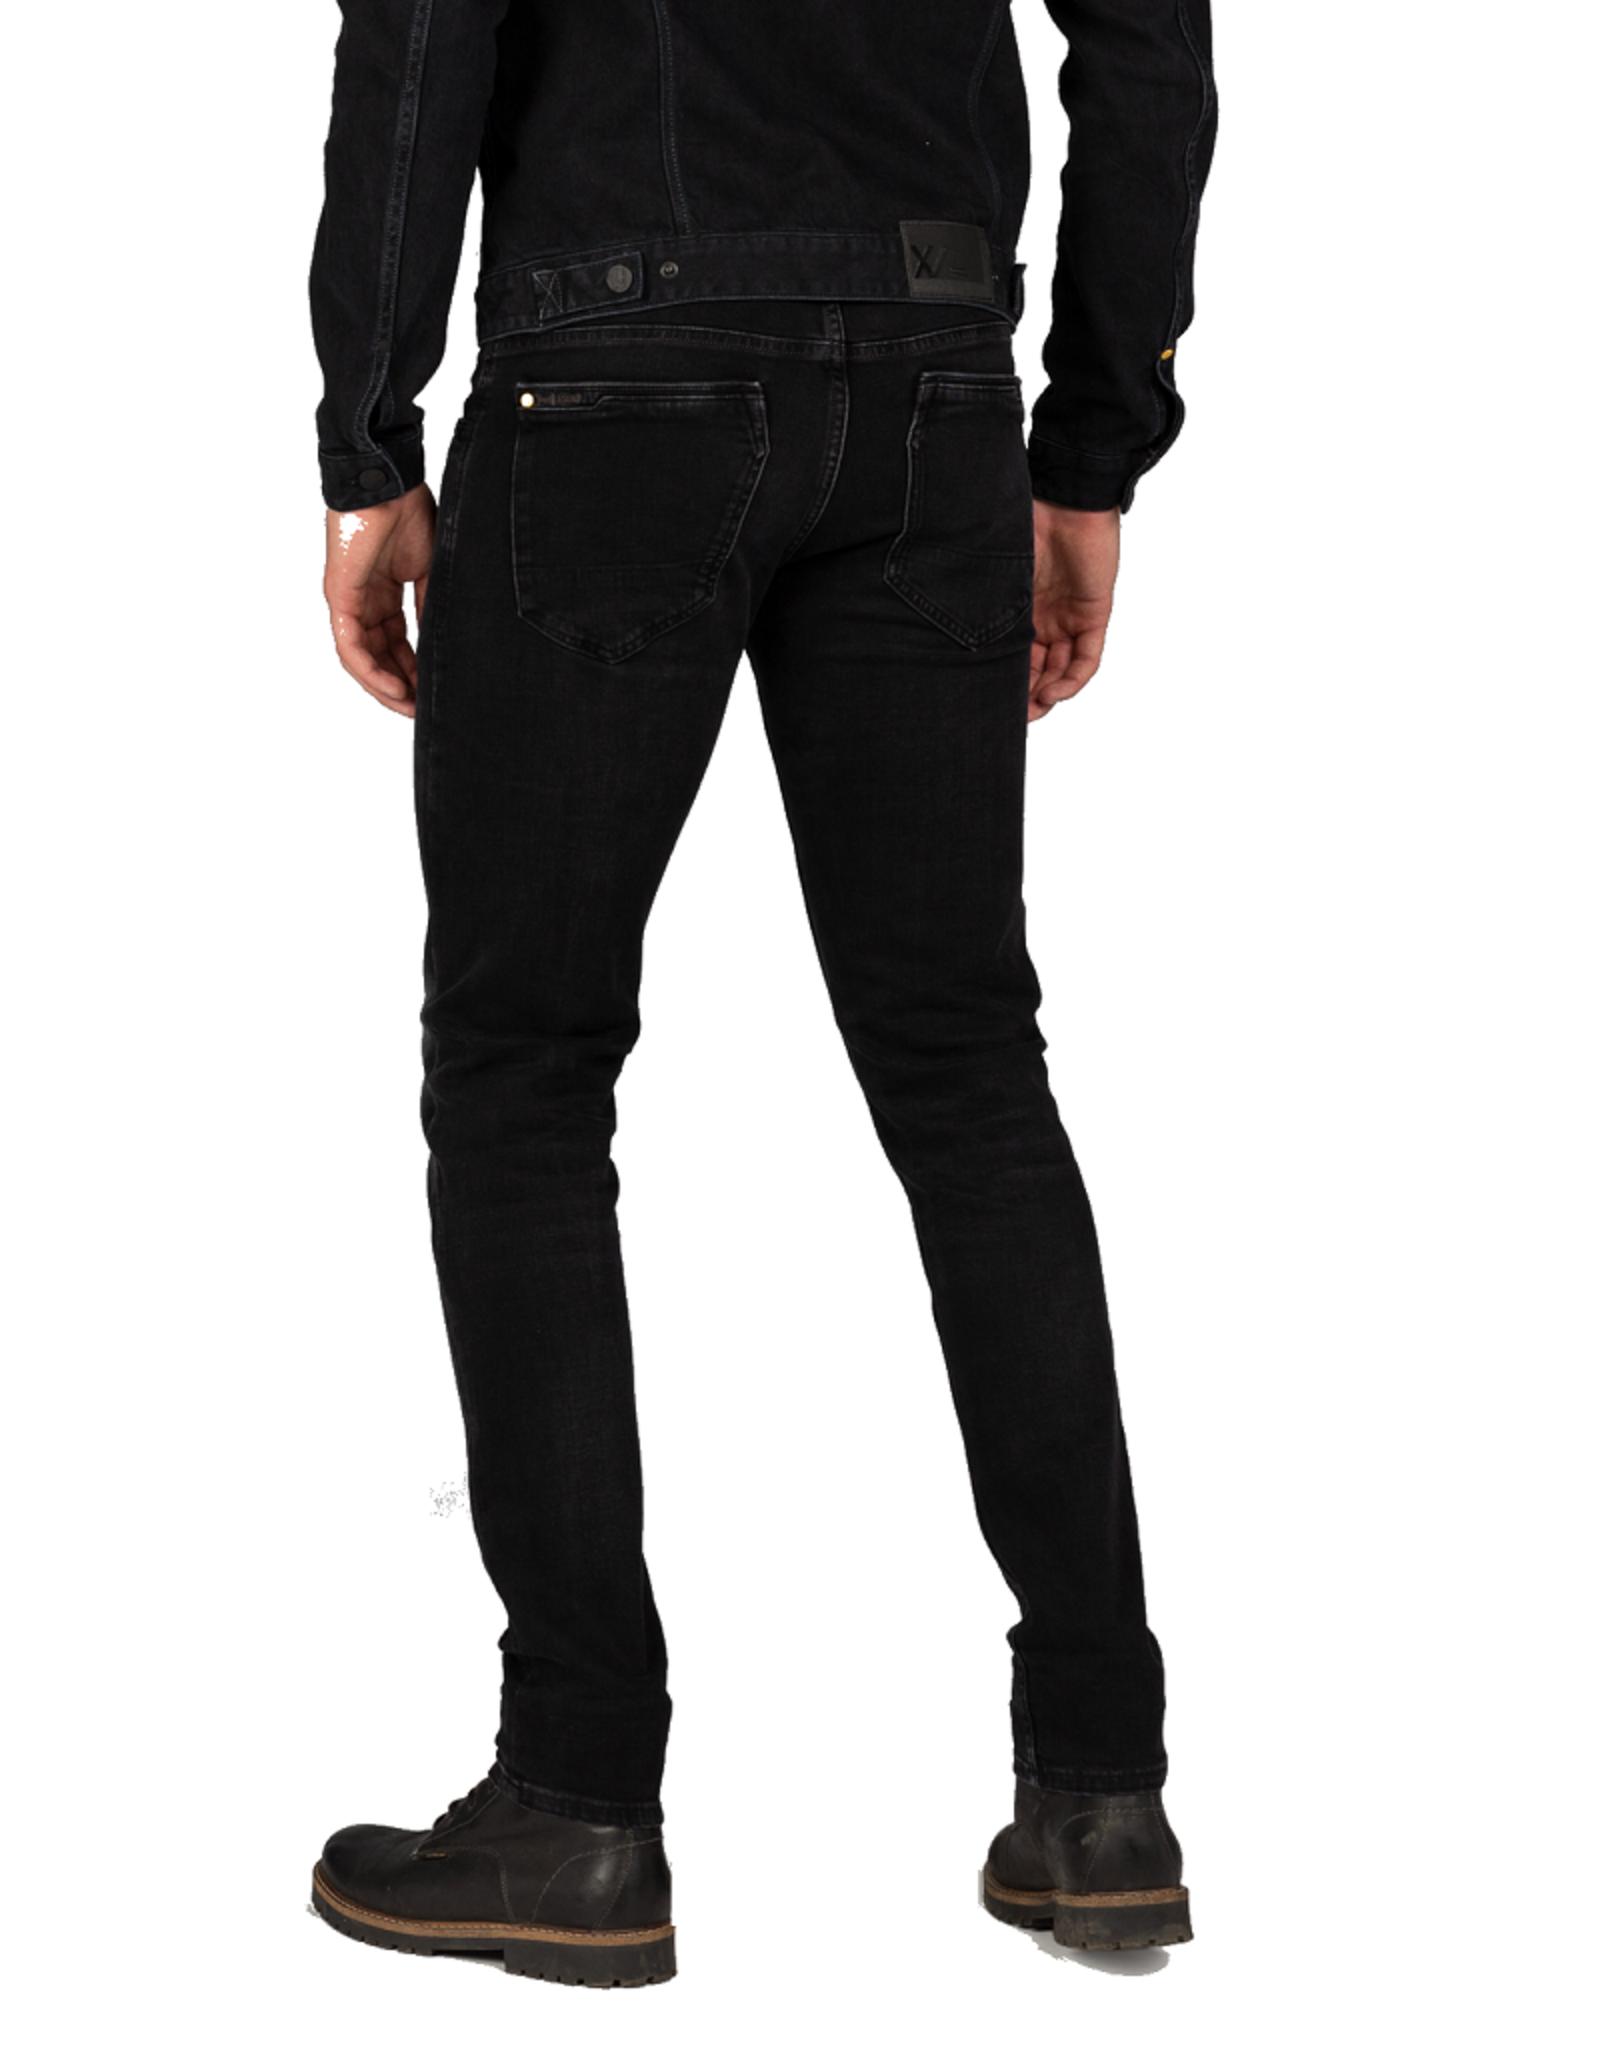 Pme Legend Vanguard comfort stretch denim Faded Black Denim